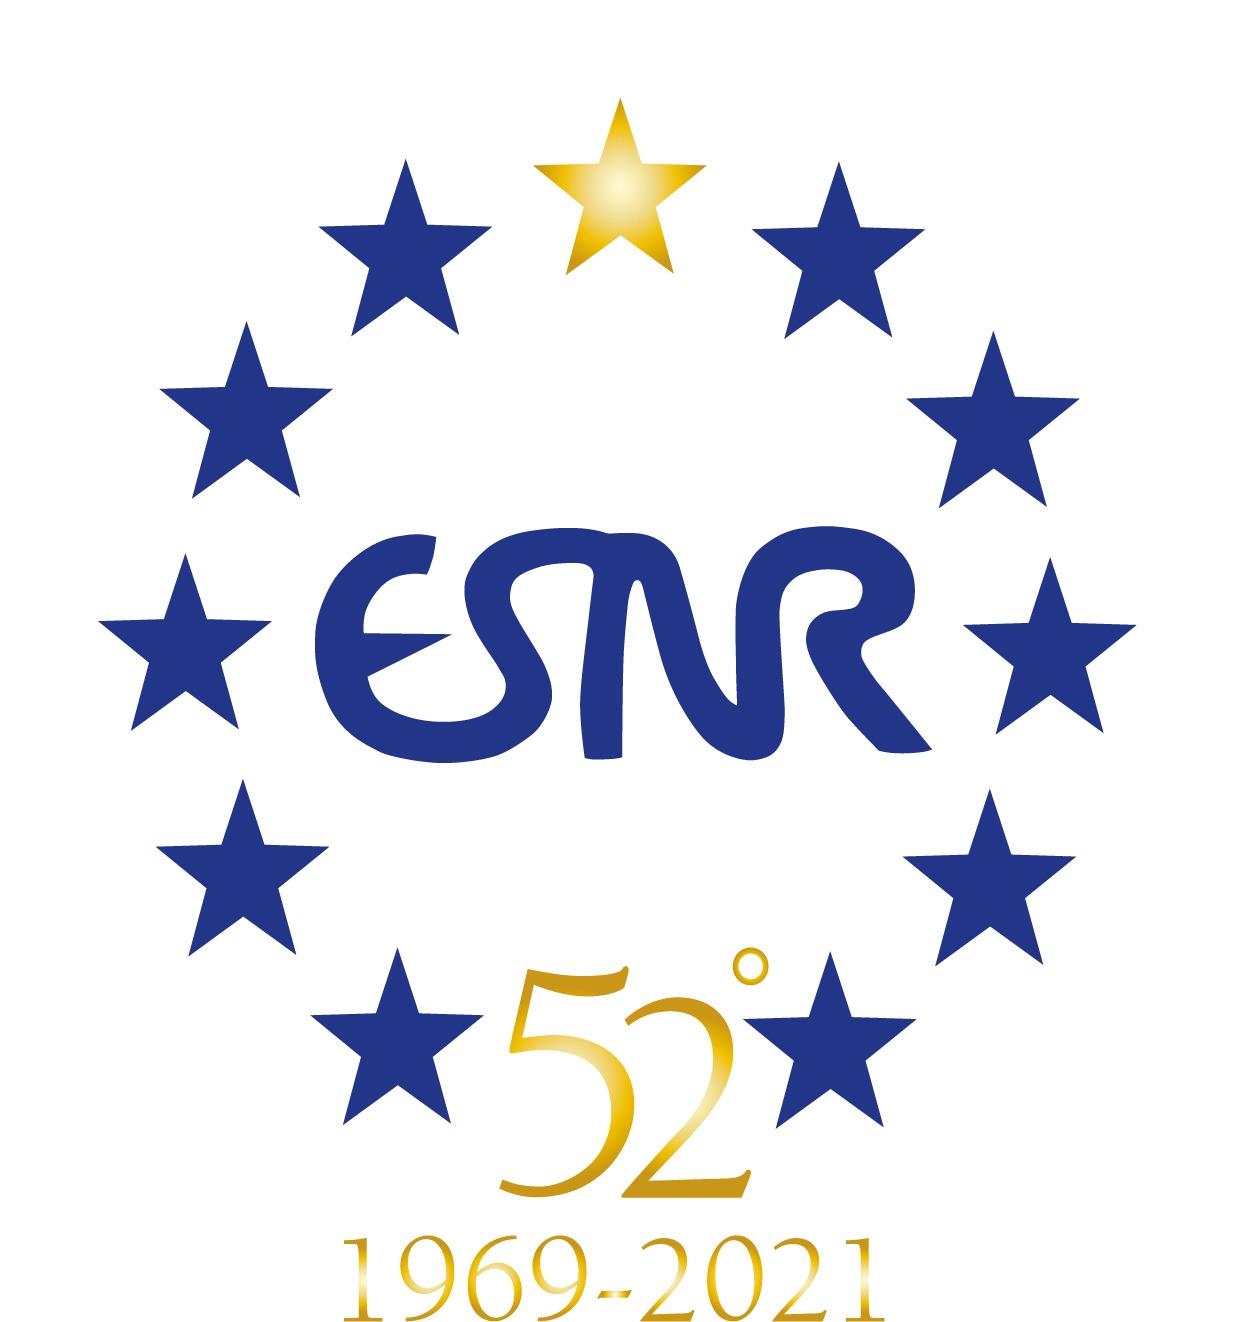 European Society of Neuroradiology (ESNR)